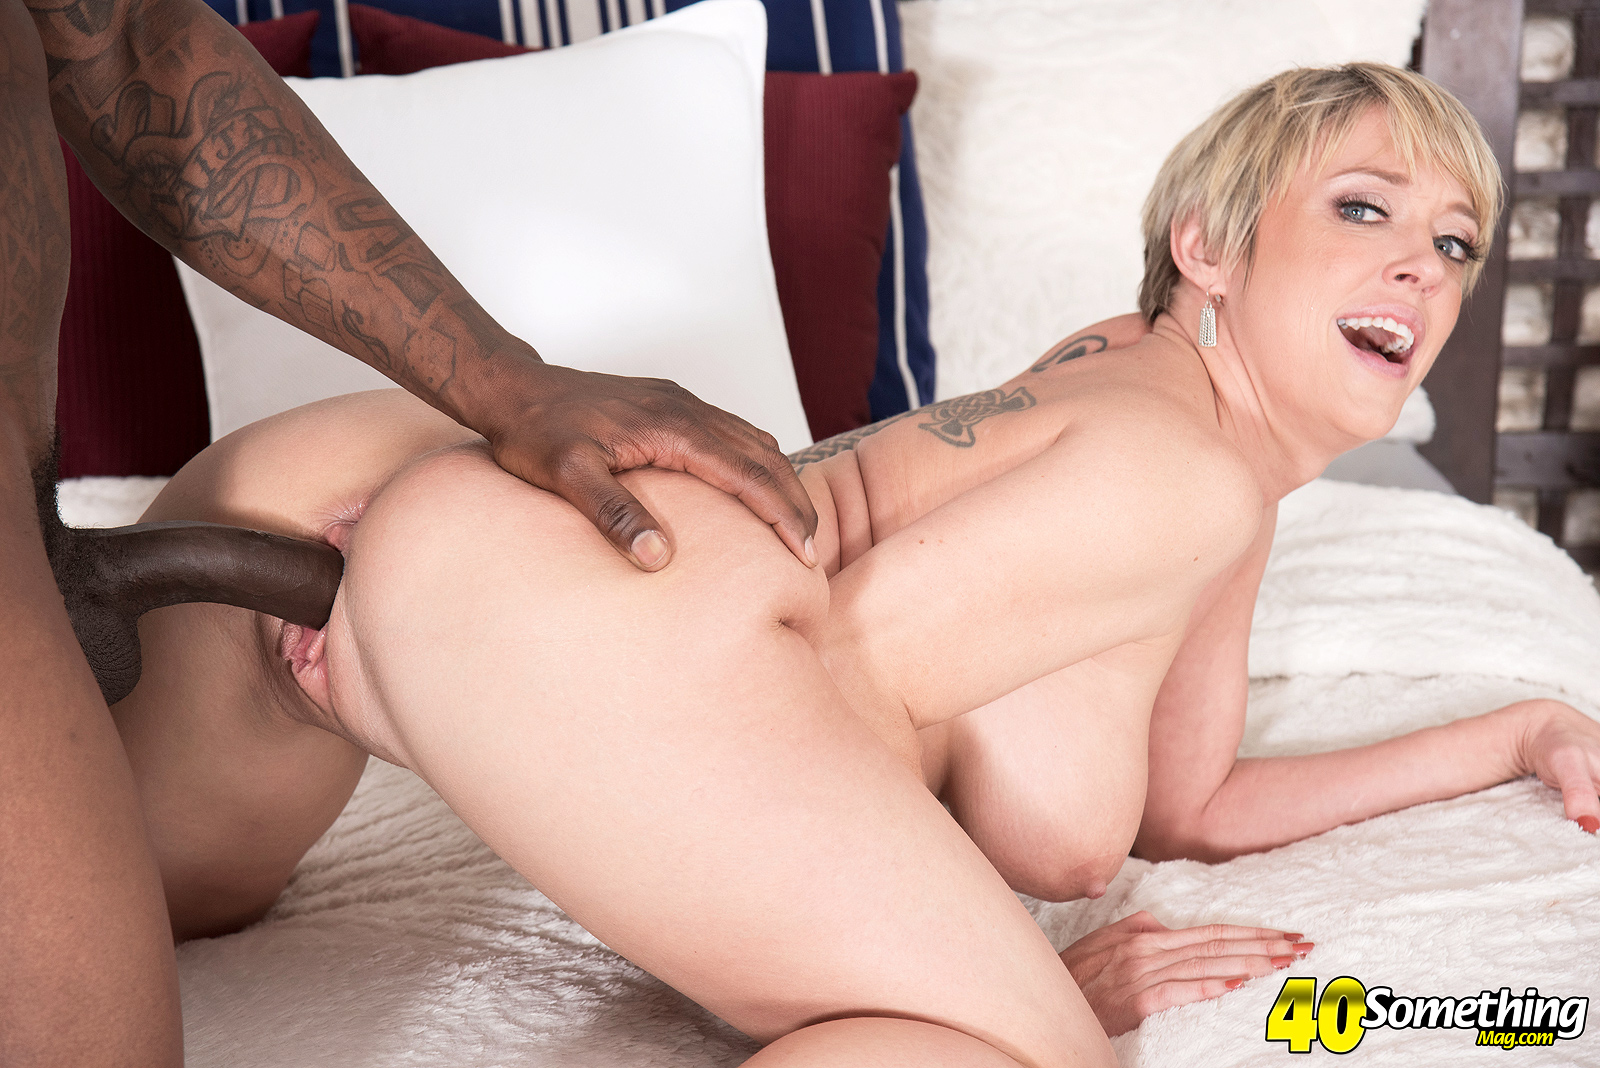 Dee williams horny milf sucking on a big cock